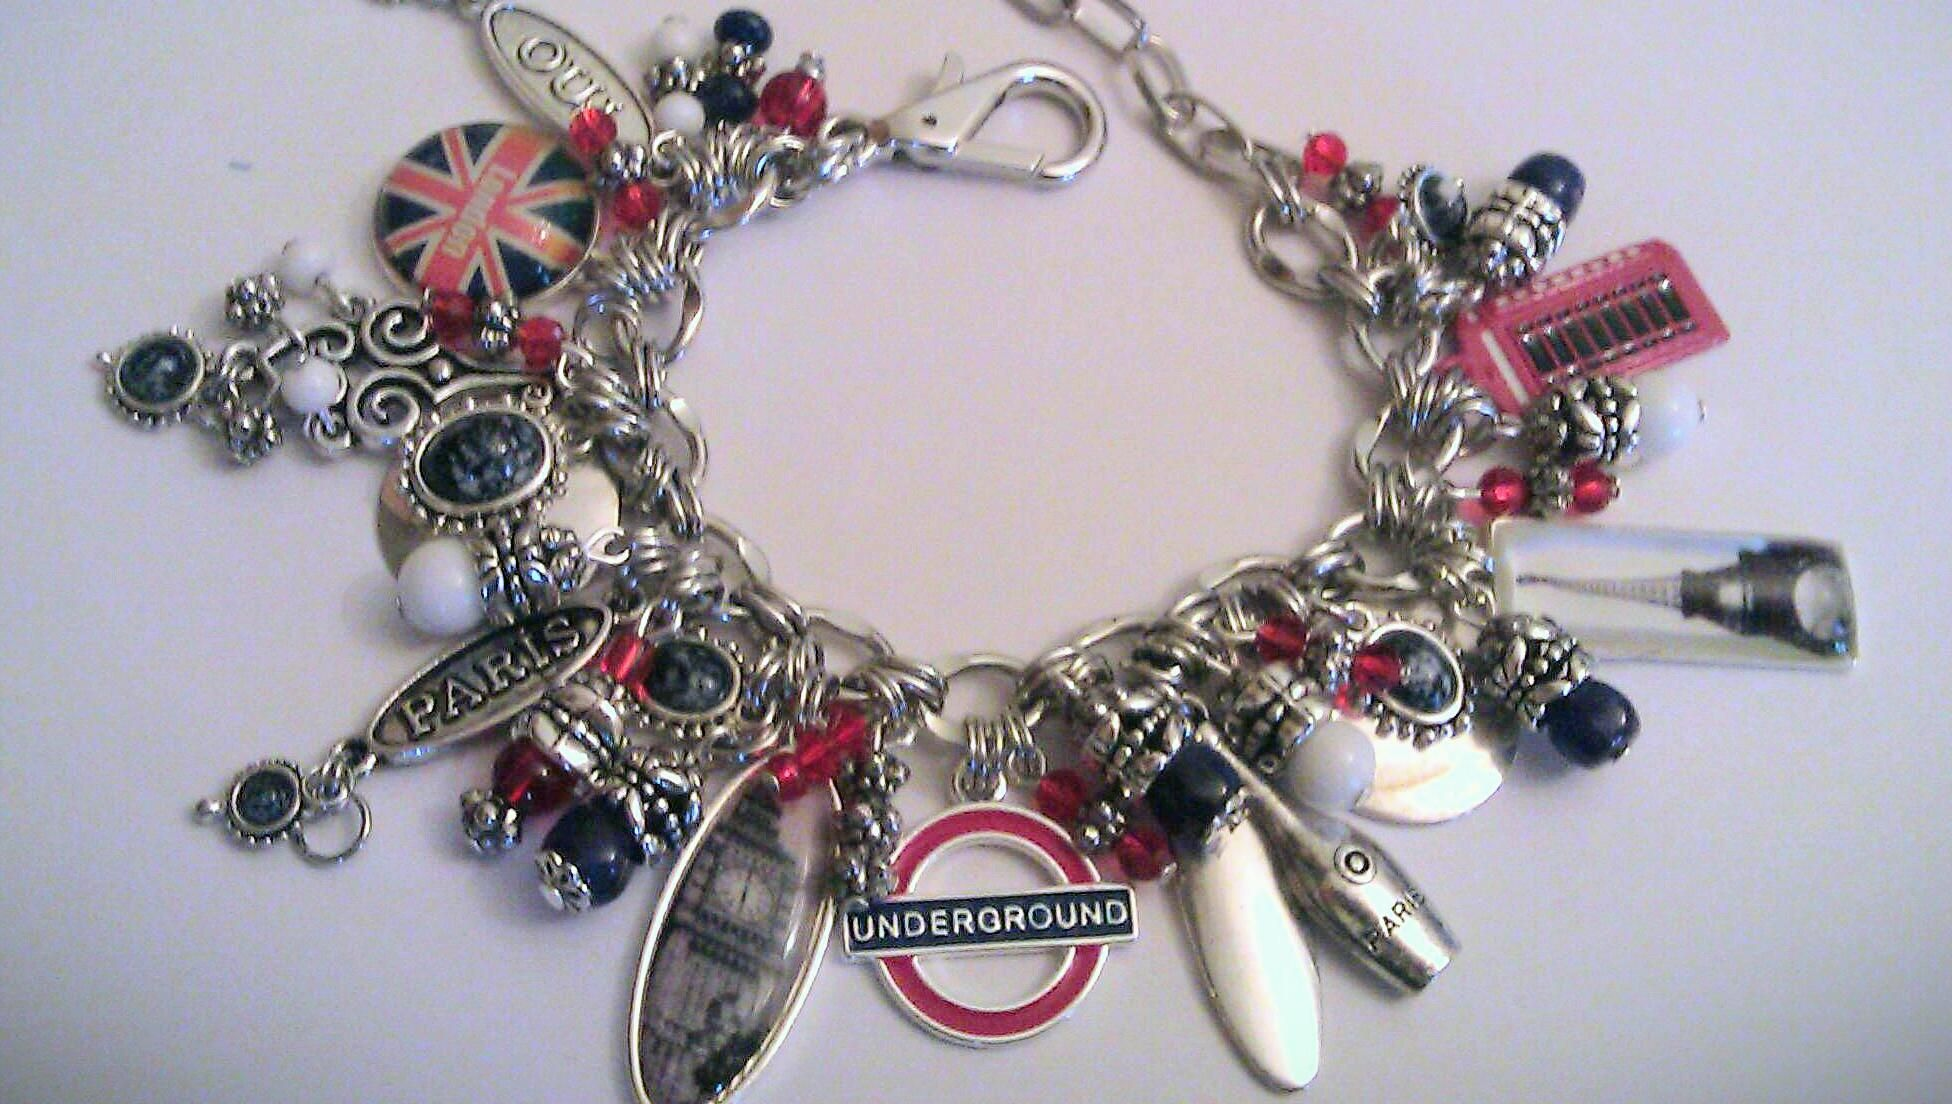 london calling travel themed charm bracelet big ben the